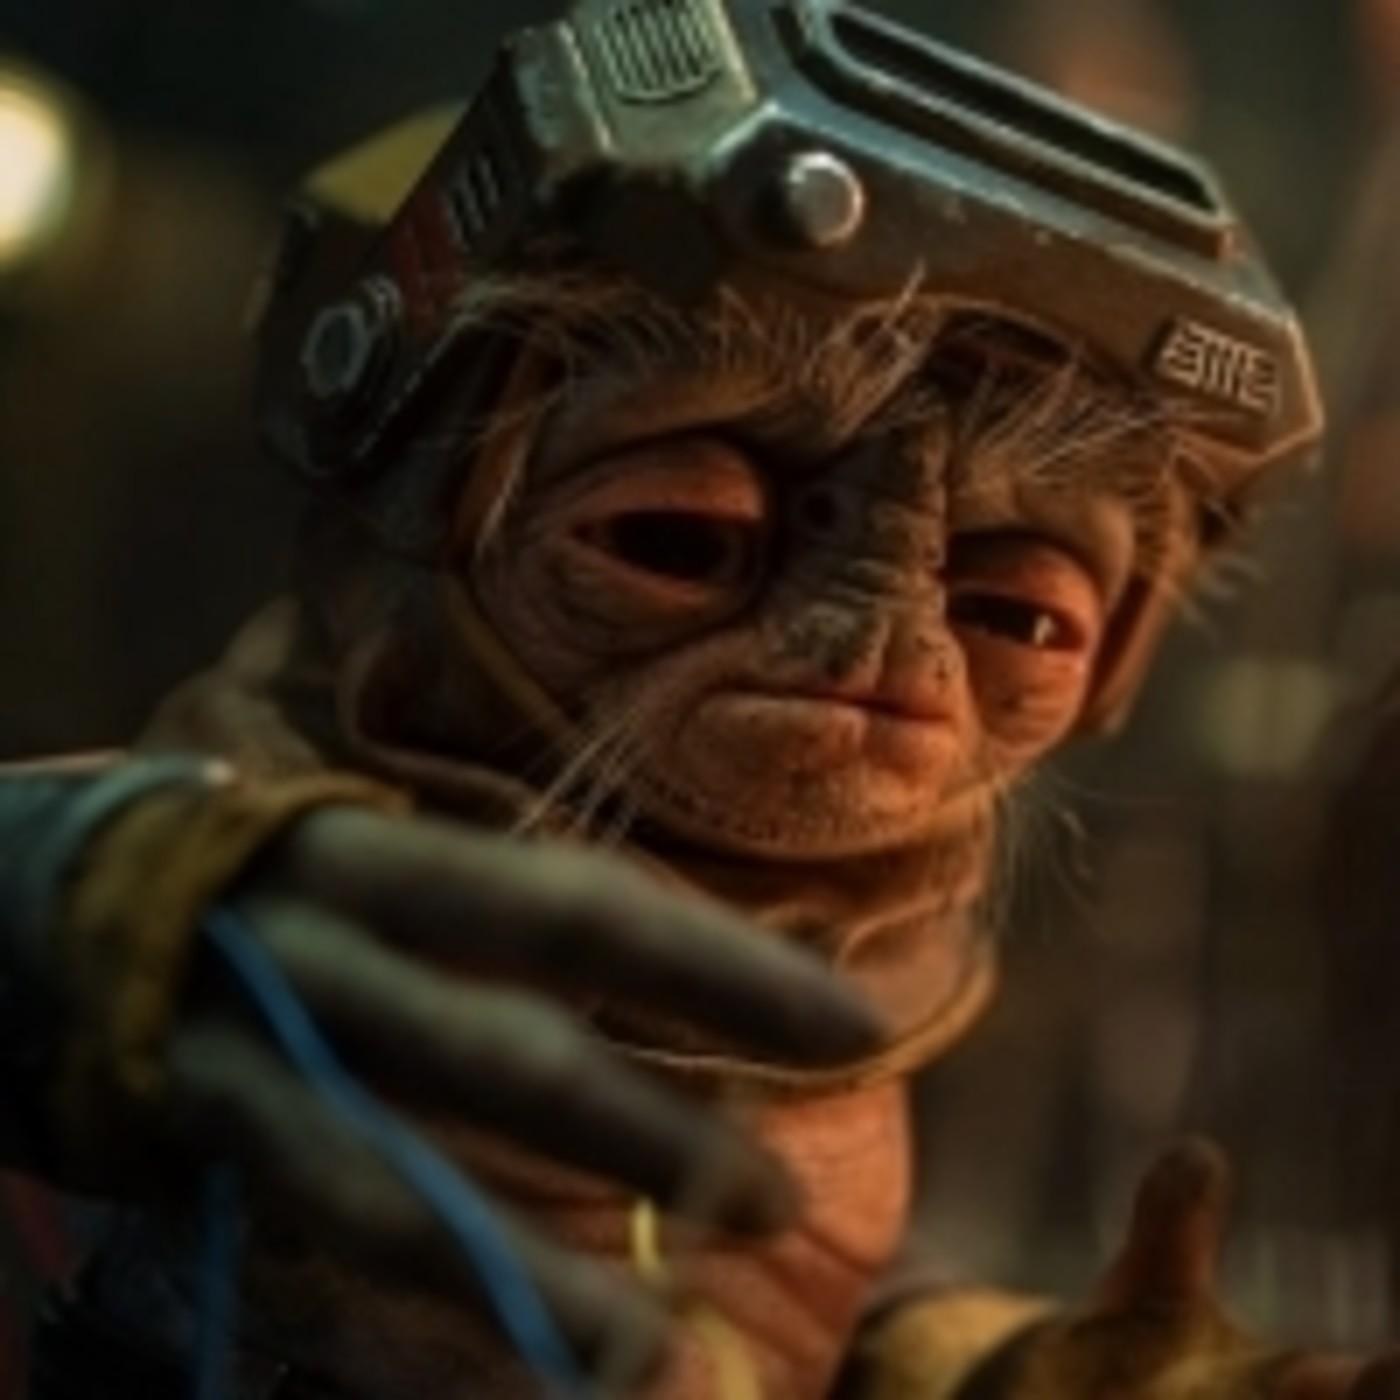 Episodio 139: El Ascensor de Skywalker